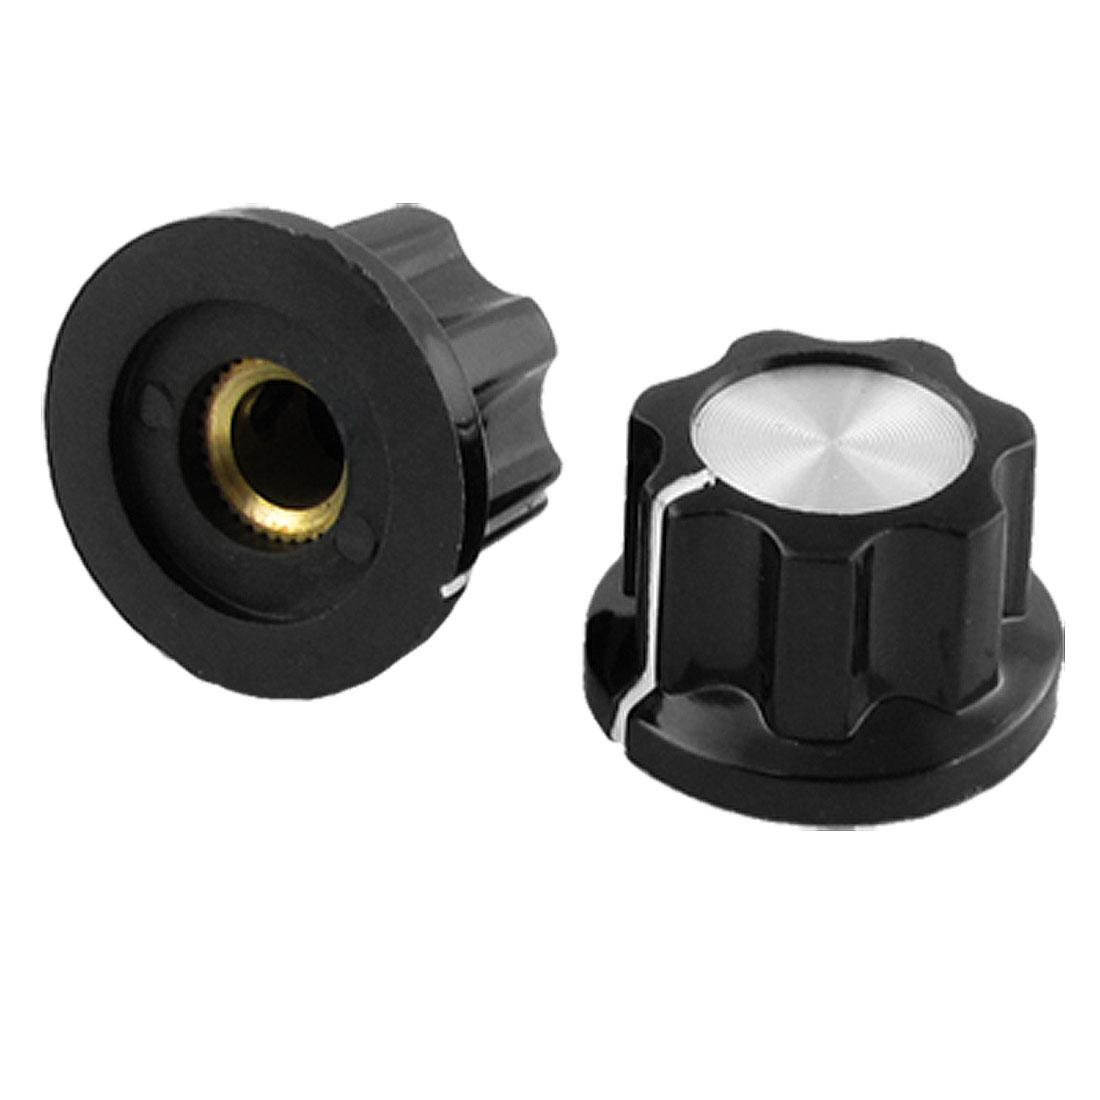 2 x Potentiometer Control Volume Rotary Knob Cap Black Tjmlu